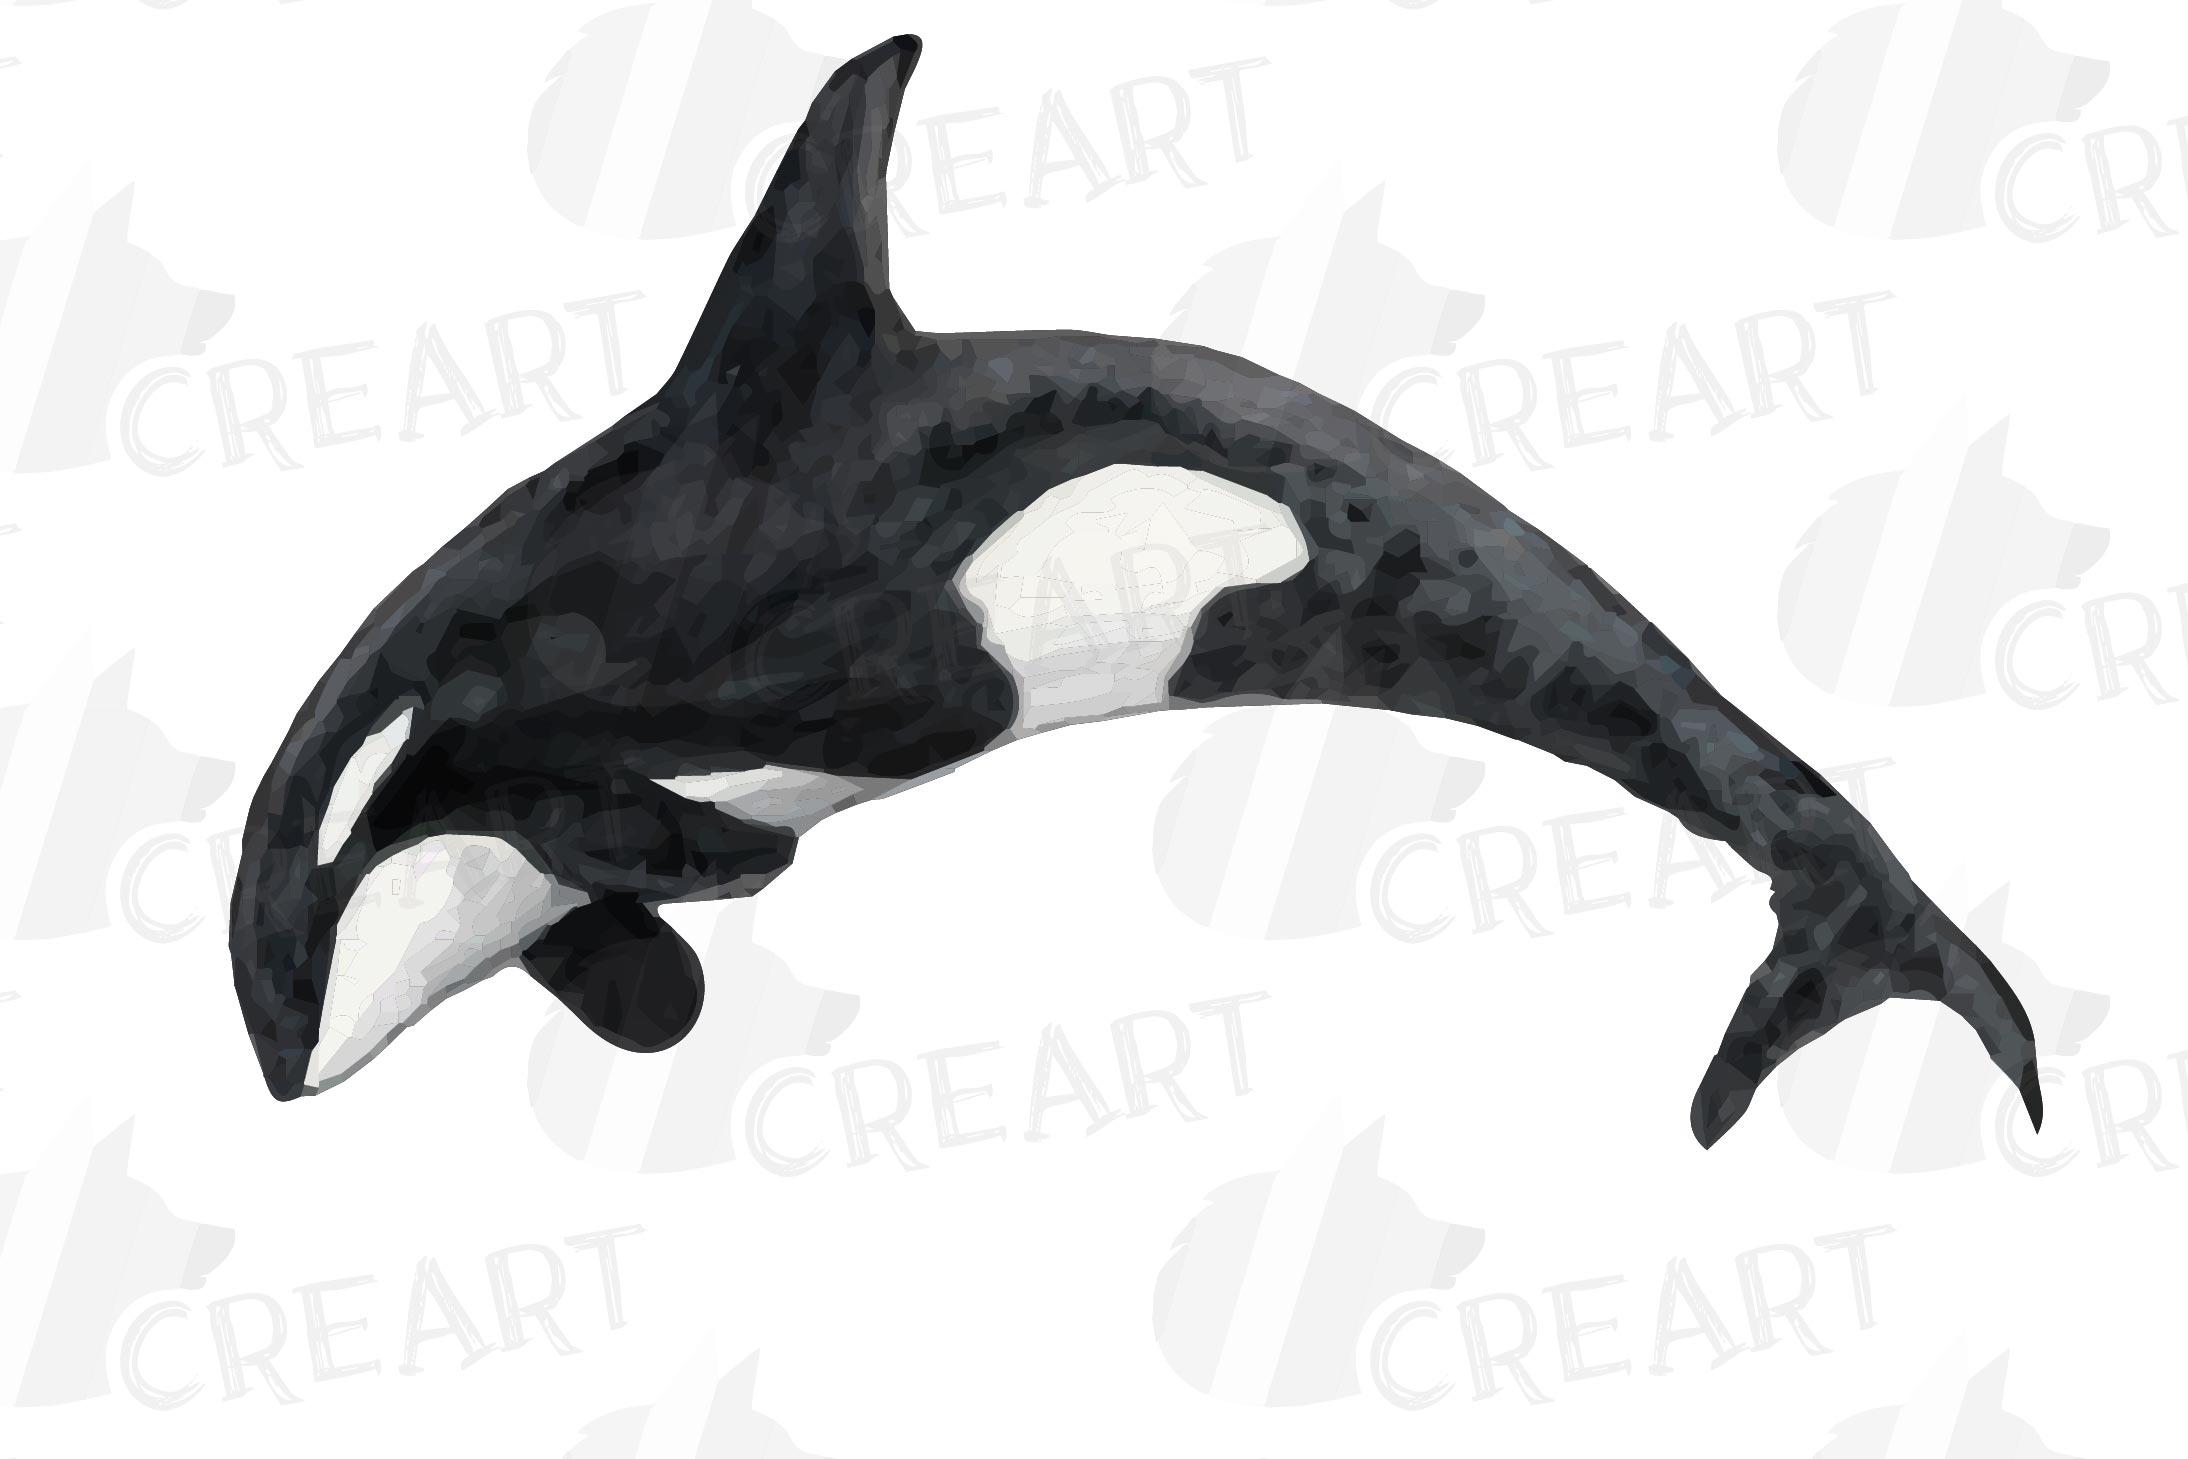 Orca Family Watercolor Clip Art Pack Killer Whales Decor